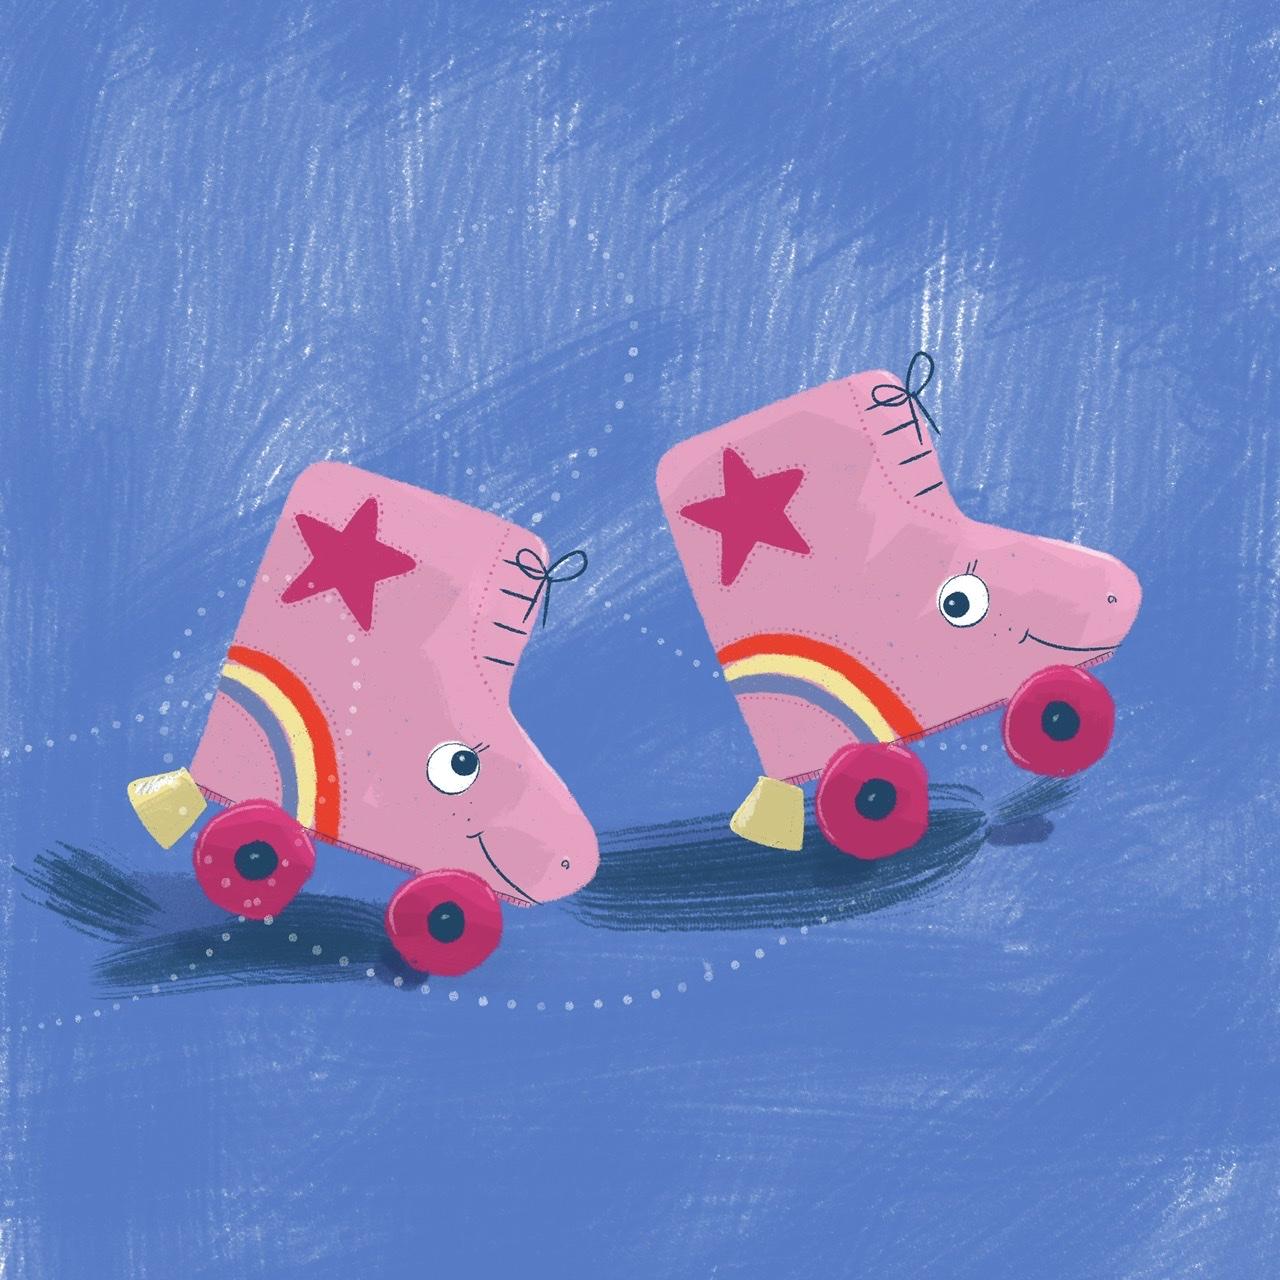 Just keep rollin' roller skates illustration by Amie Sabadin